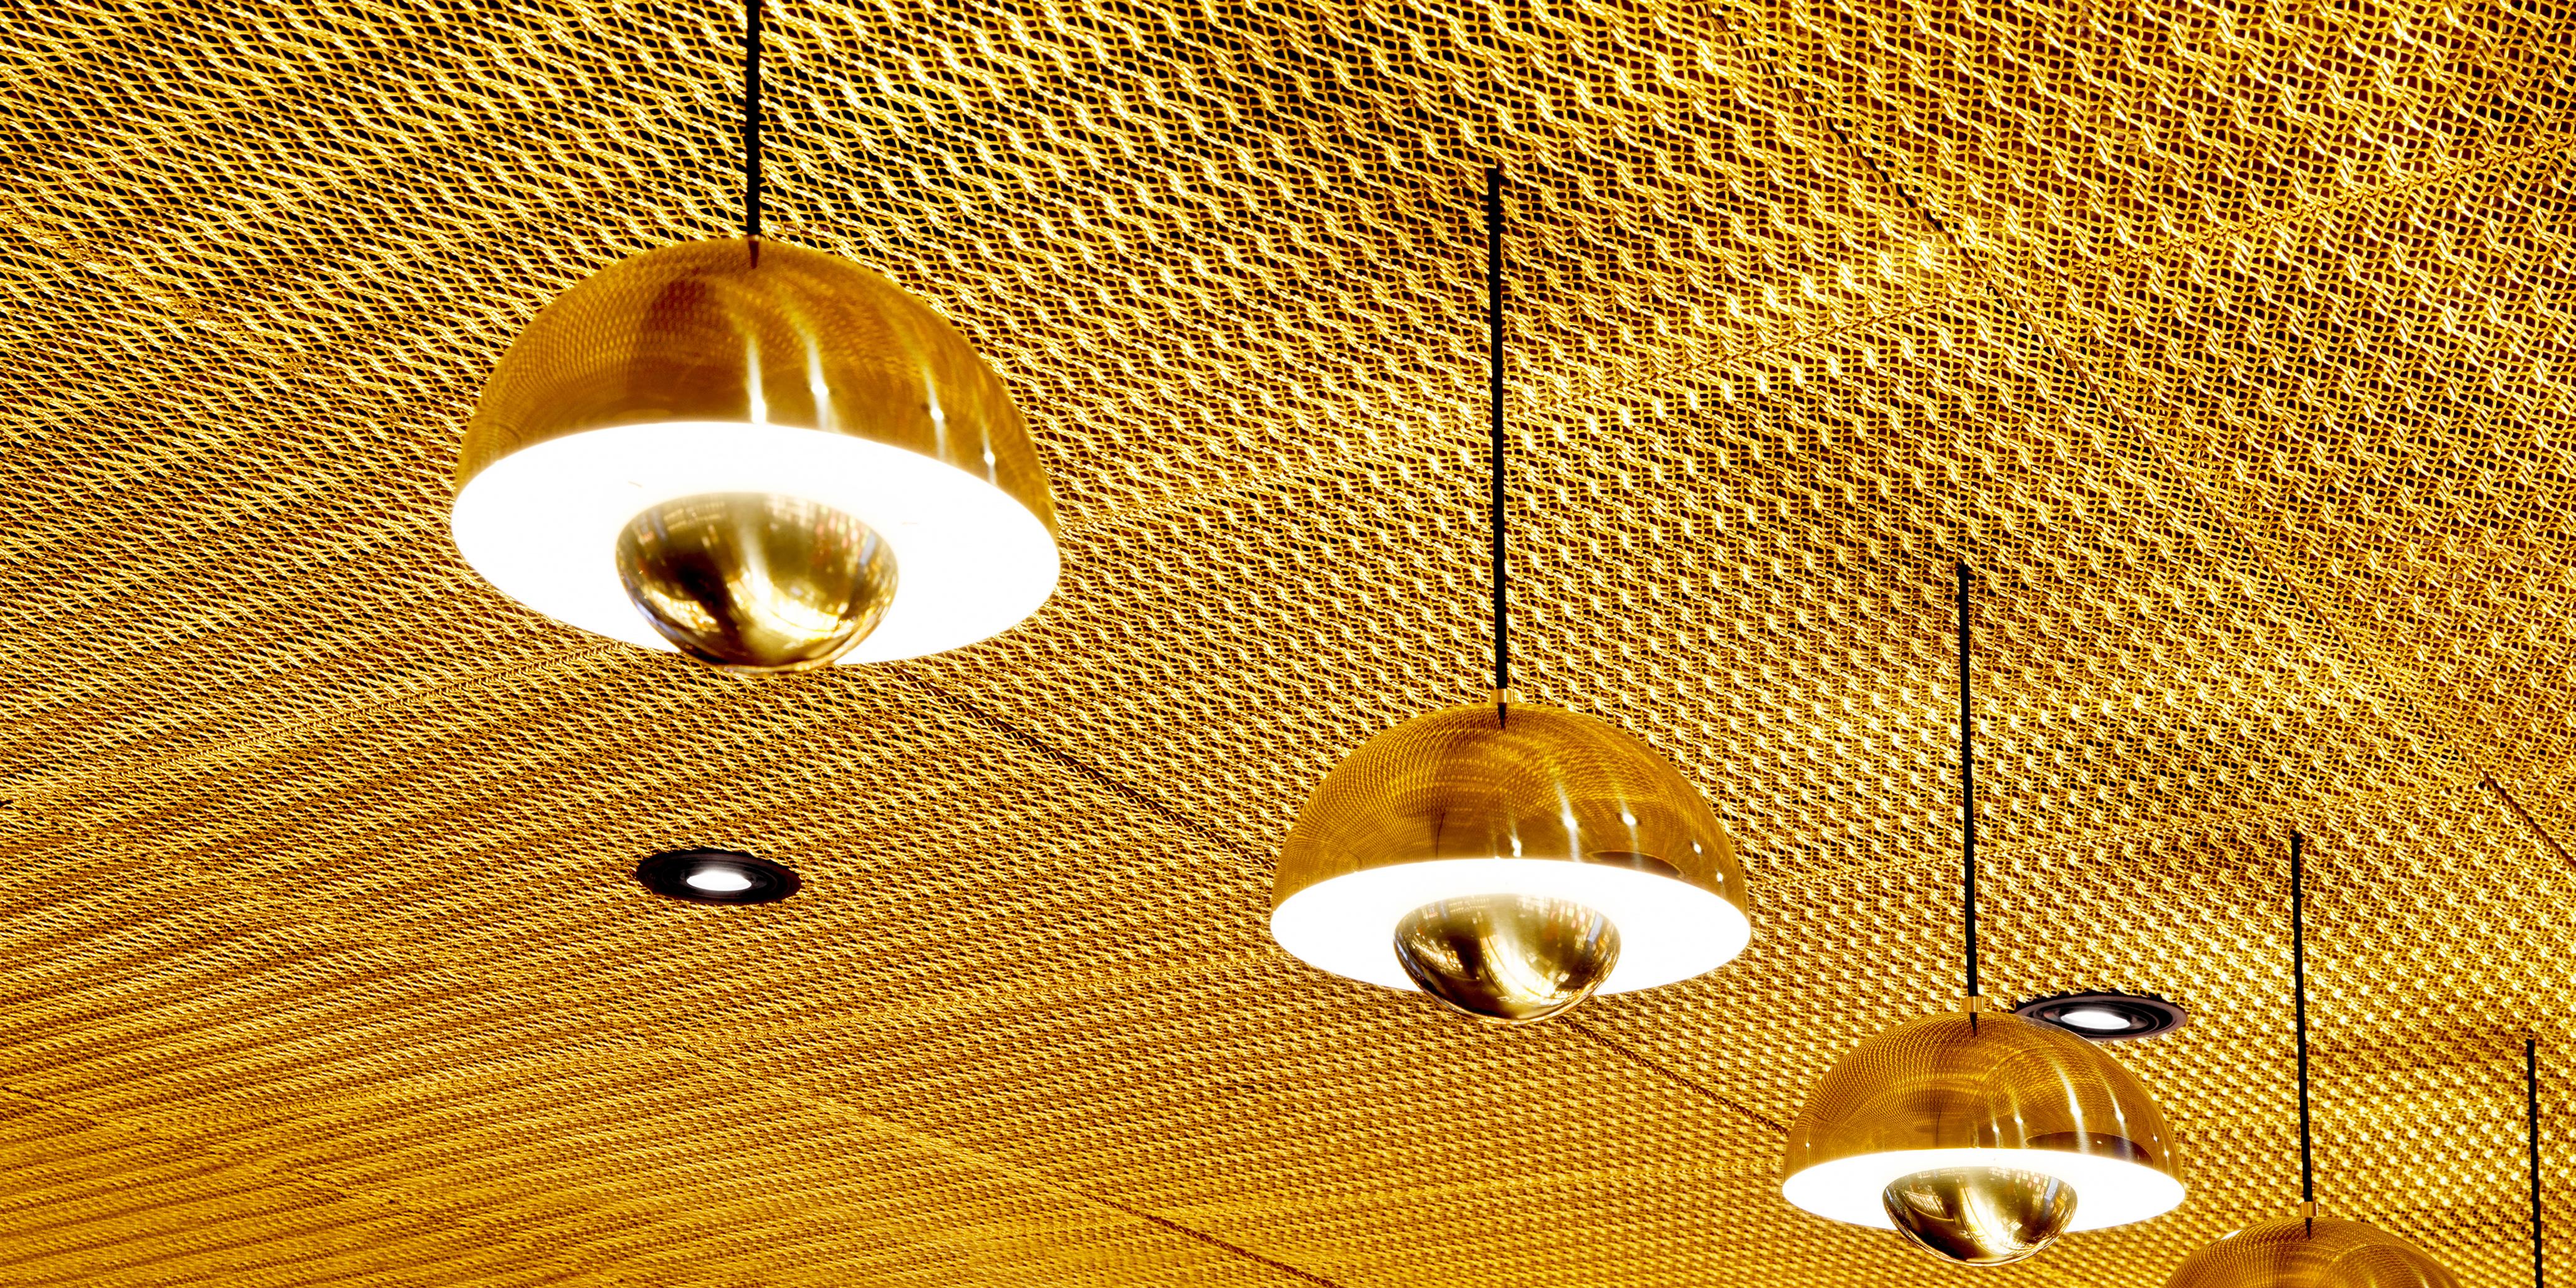 Confiserie Sprüngli Zürich HB Lampen Gold